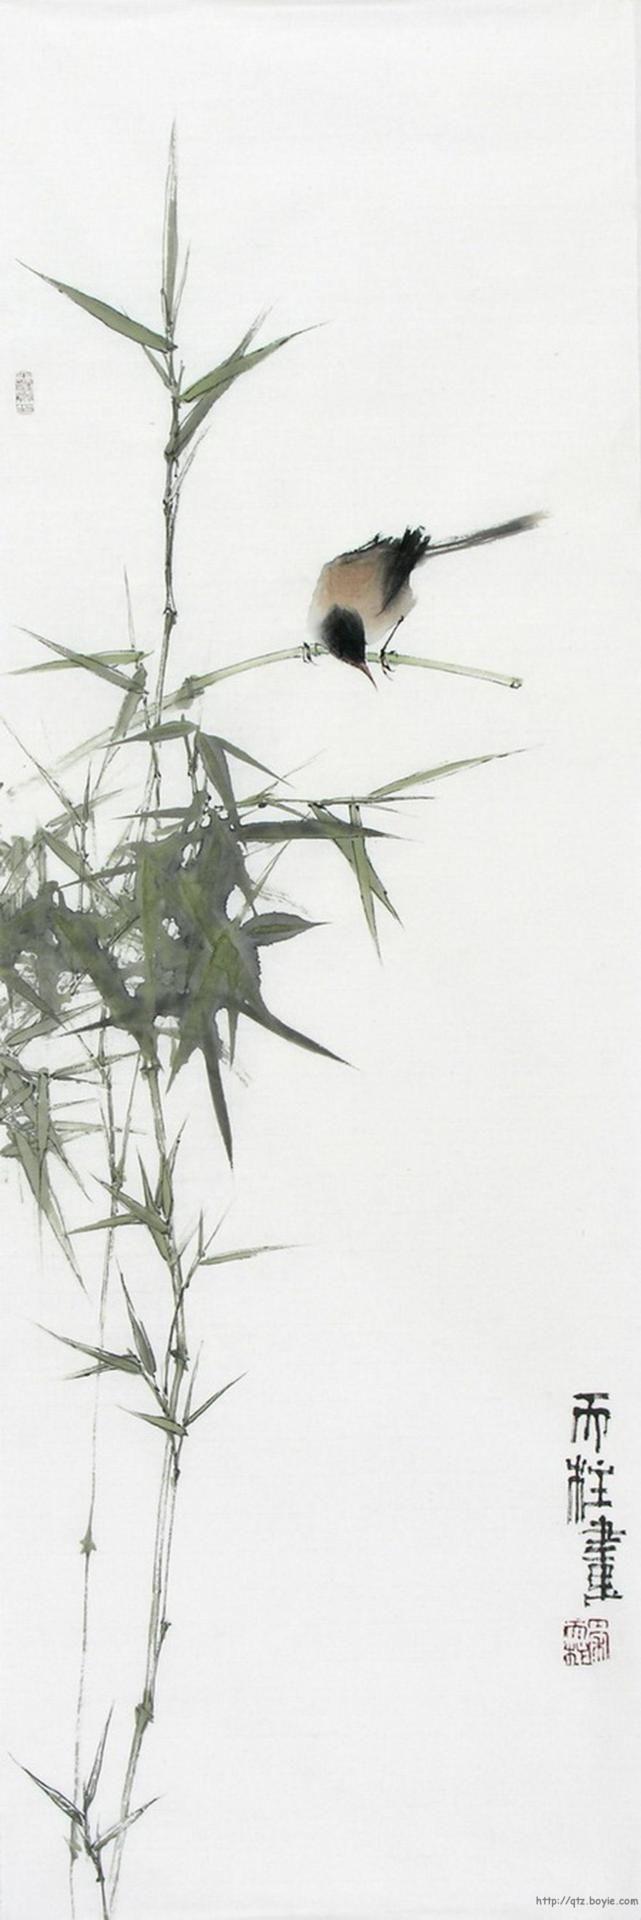 Qin Tianzhu - http://www.fineartgalleryhk.com/gallery/chinese/artists1.phtml?strForceLang=en&ArtistsID=27